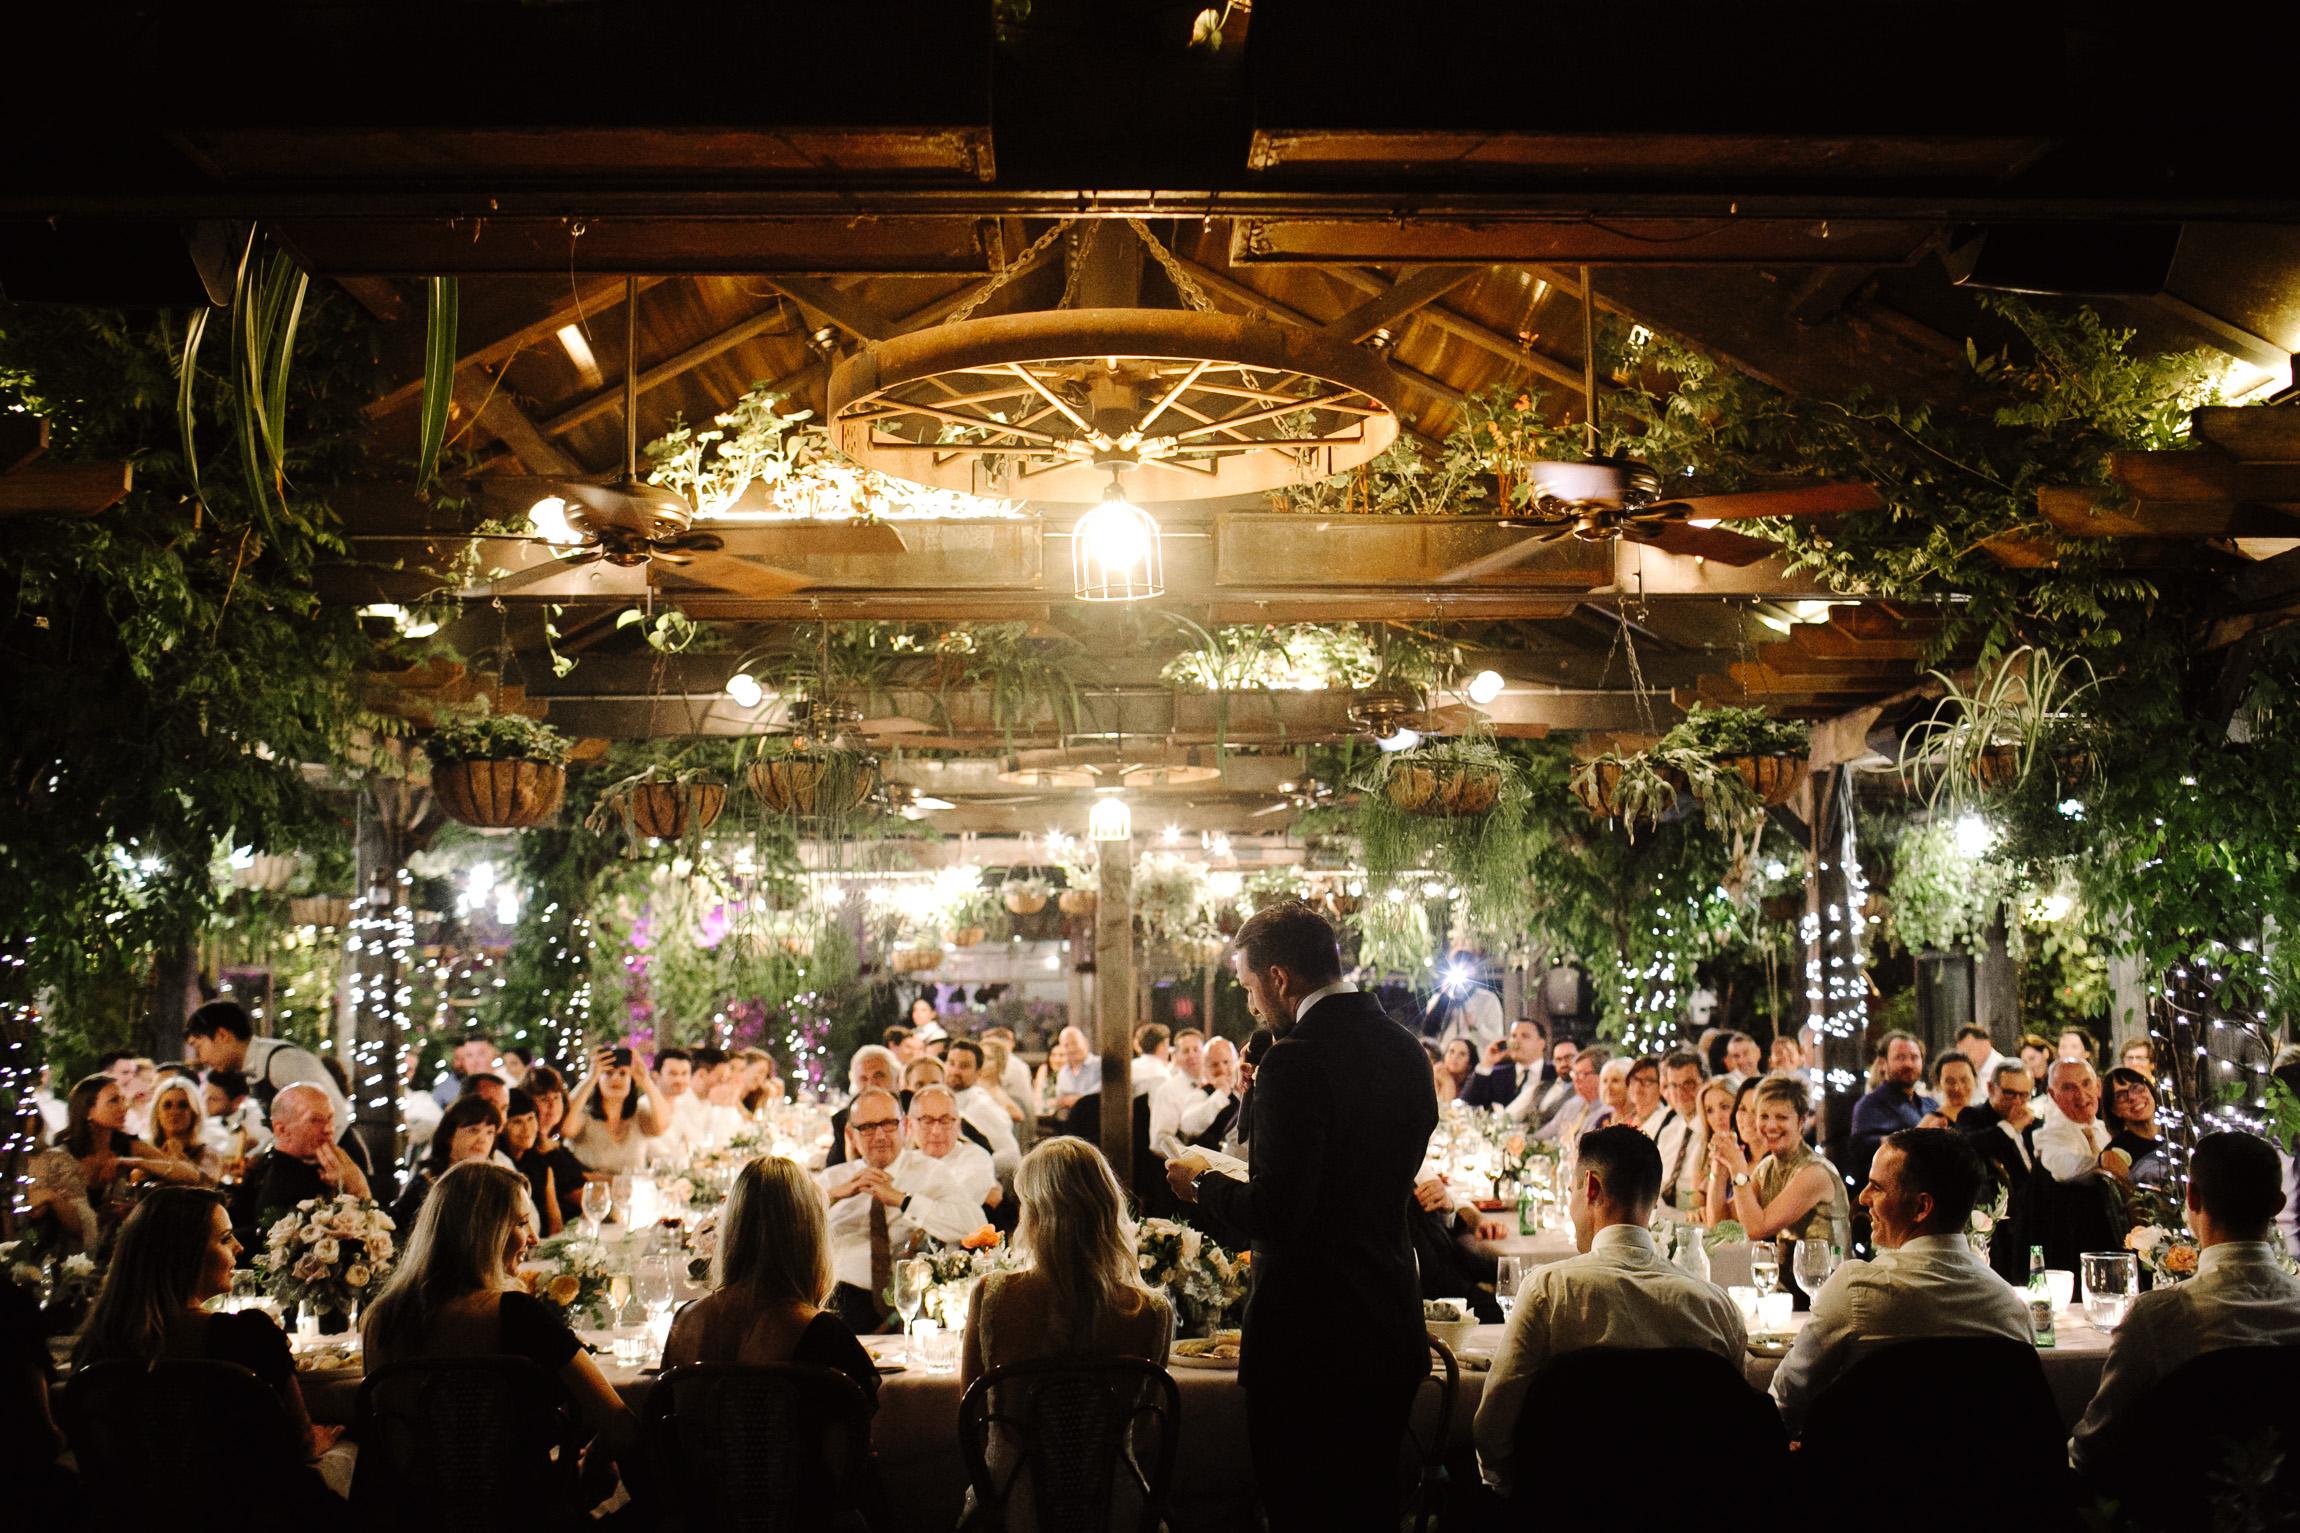 180223_justinaaron_wedding_charlotte_david_h-283.jpg